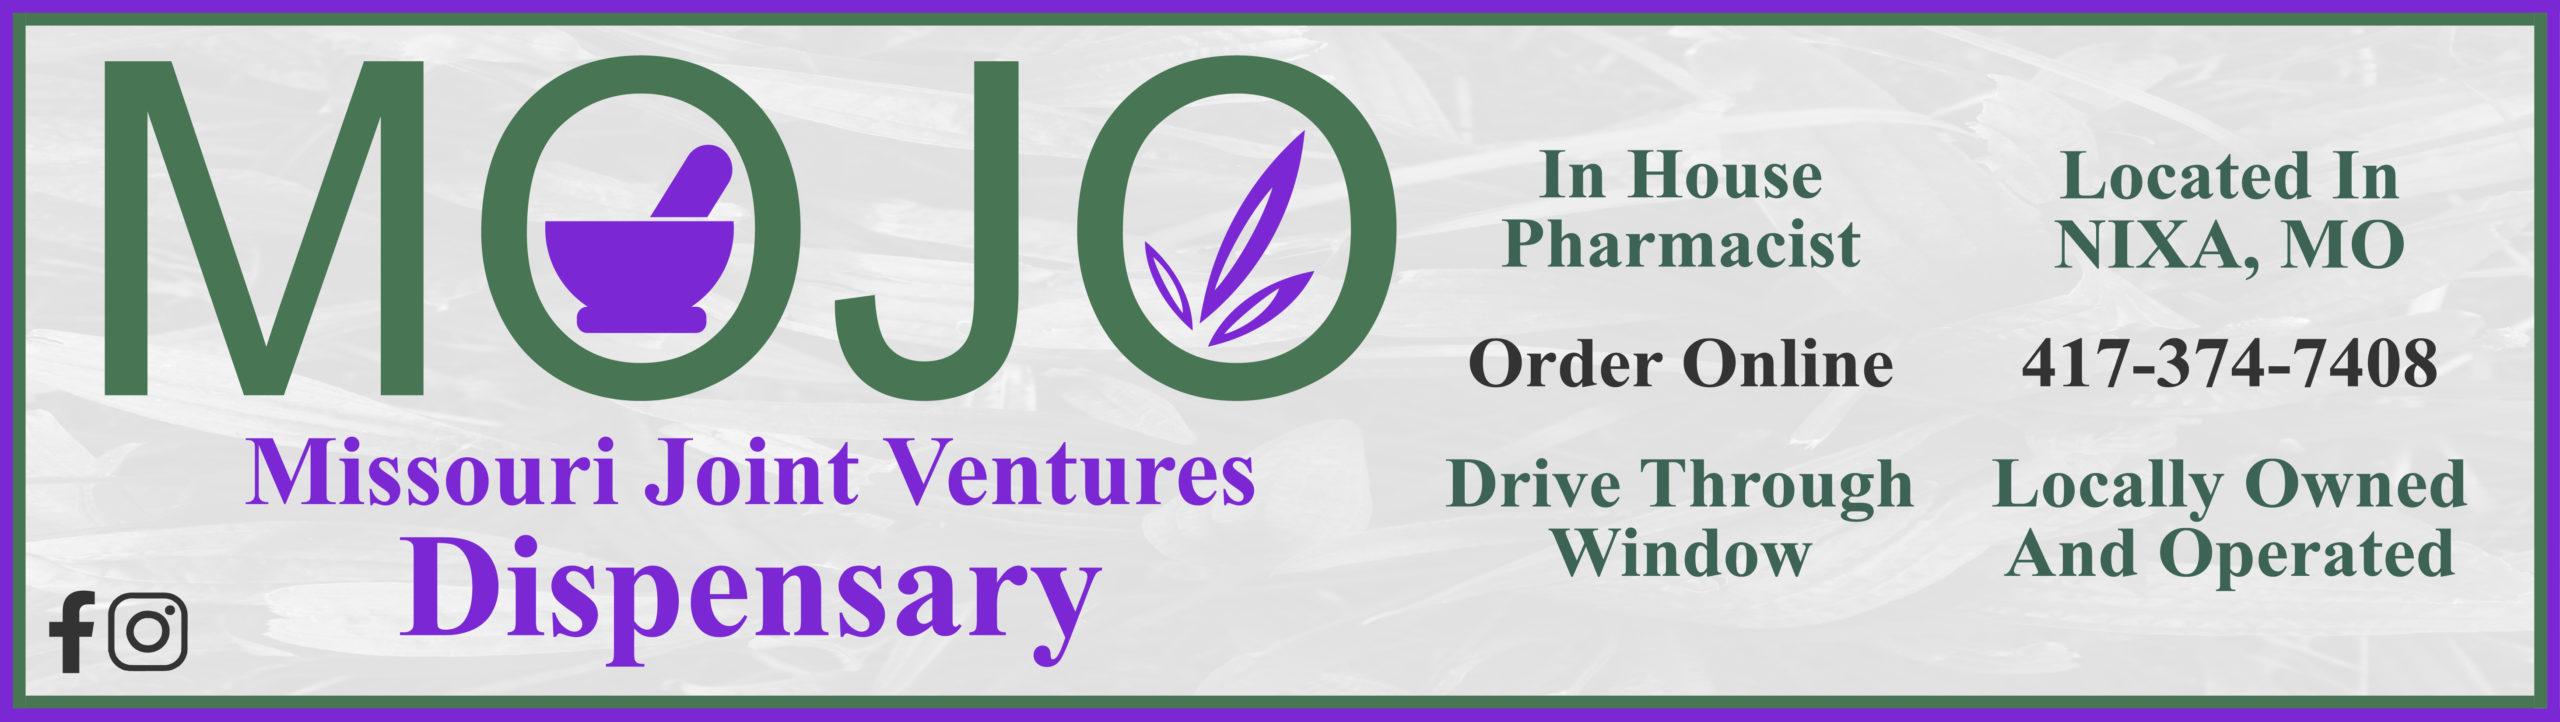 missouri medcard medical marijuana mmj card MOJO nixa dispensary